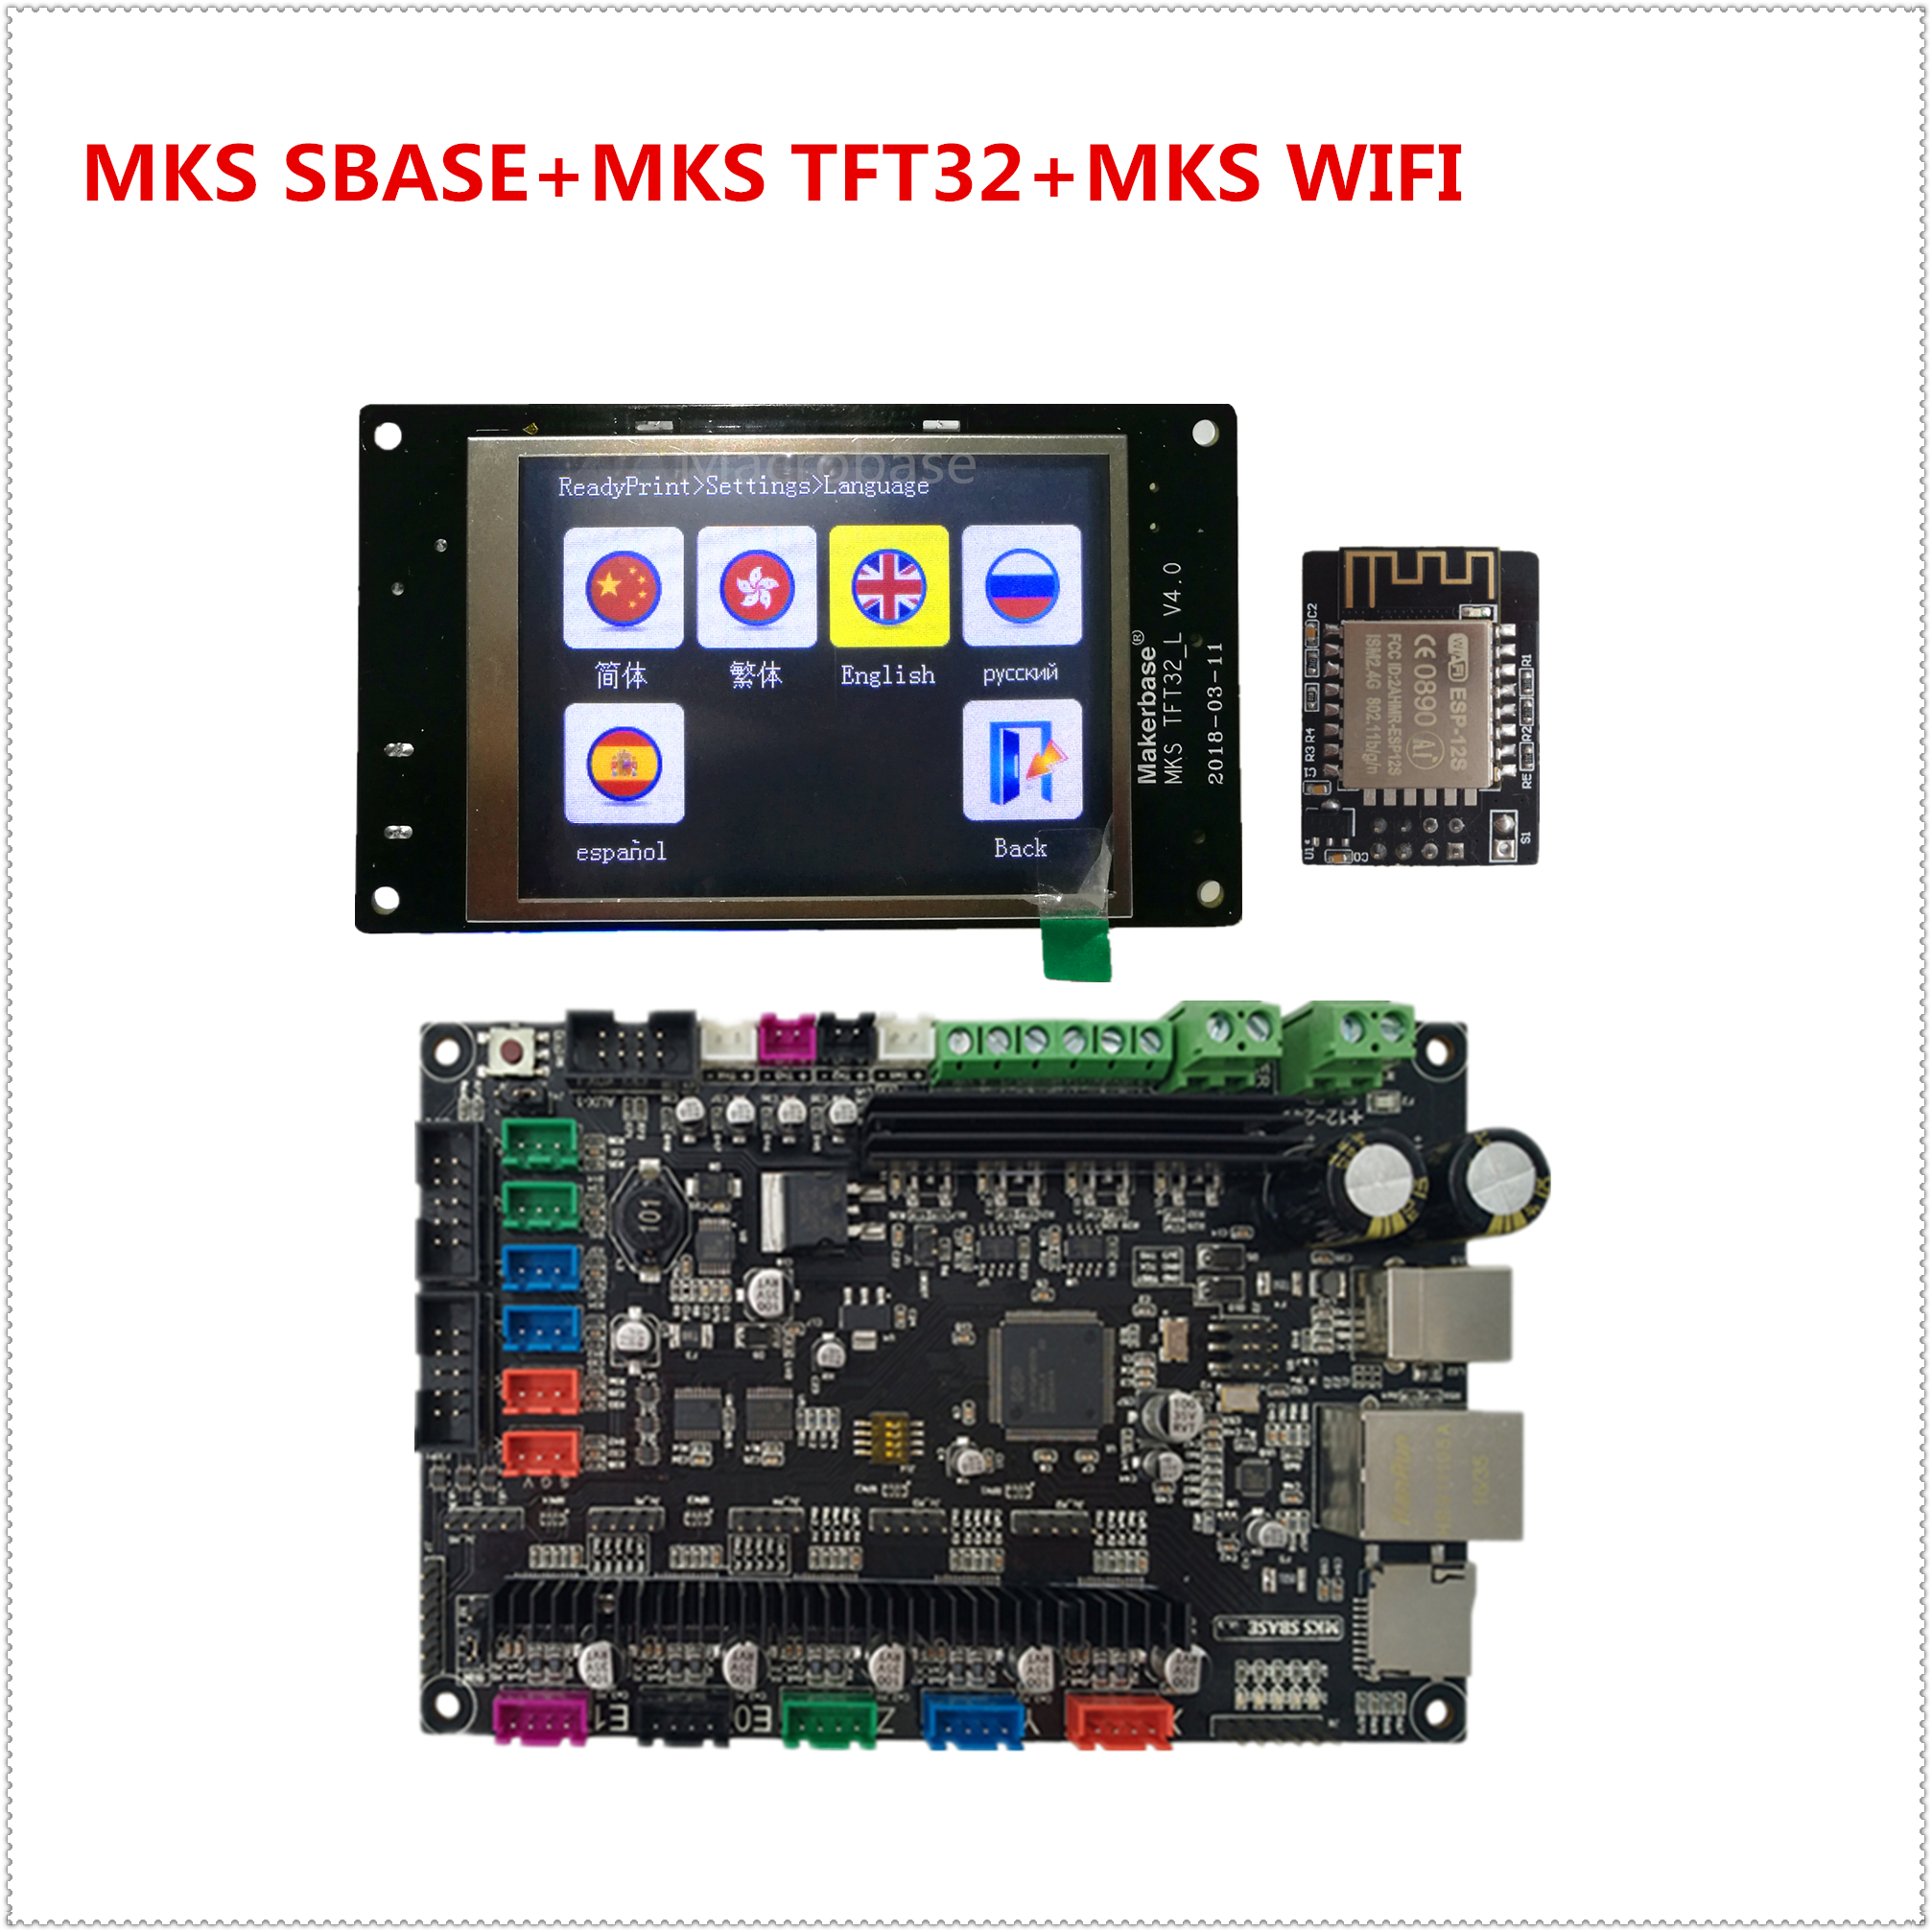 MKS SBASE V1 3 MKS TFT32 V4 0 display MKS TFT WIFI 3D printer electronic accessories